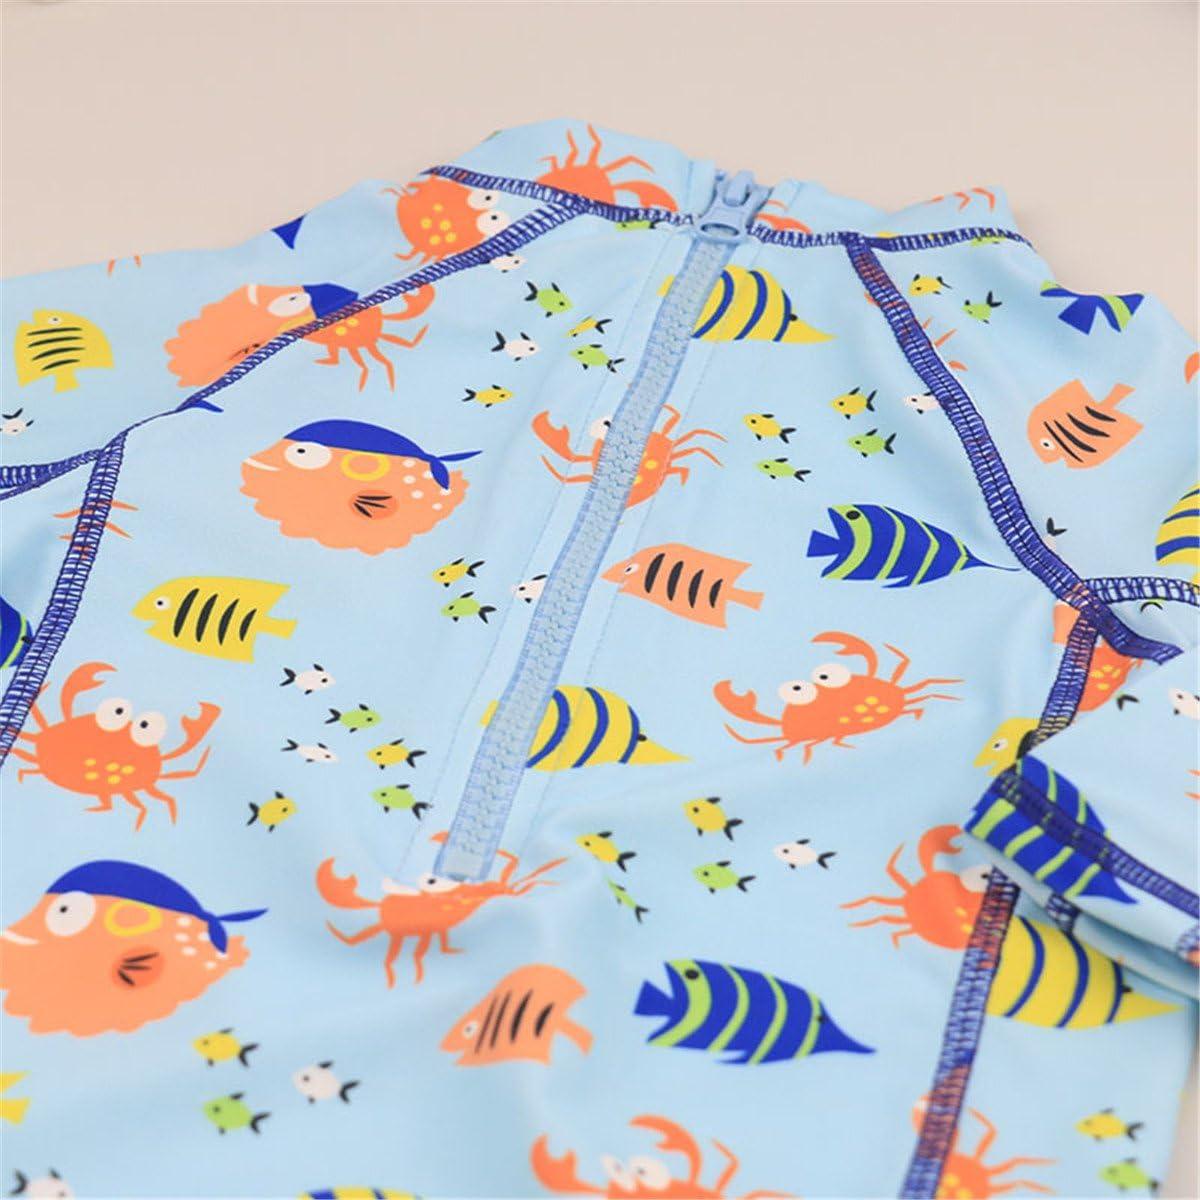 UV Swimsuit with Sun Hat REWANGOING Baby Kids Boys Girls One Pieces Cartoon Print Long Sleeve Rash Guard UPF 50